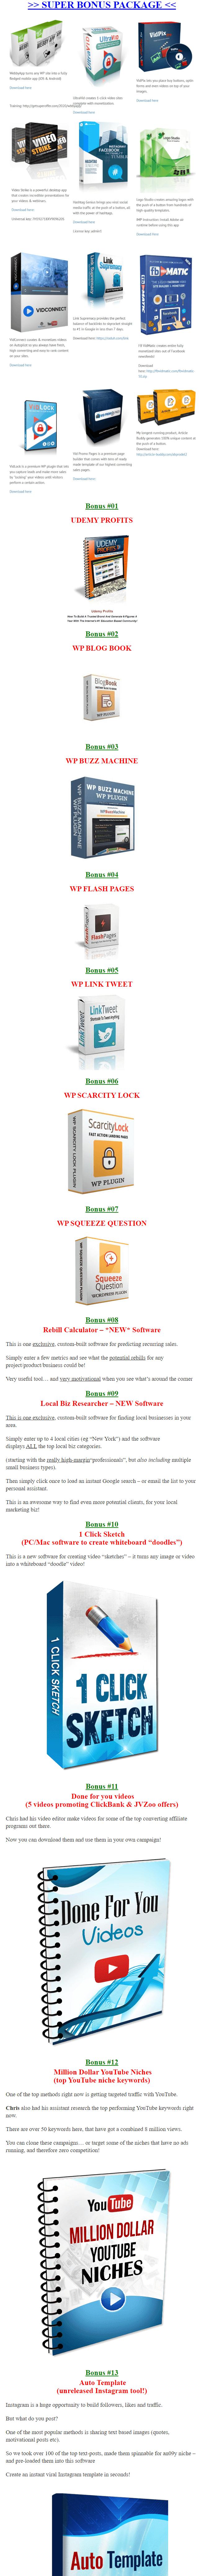 Bonus05-1